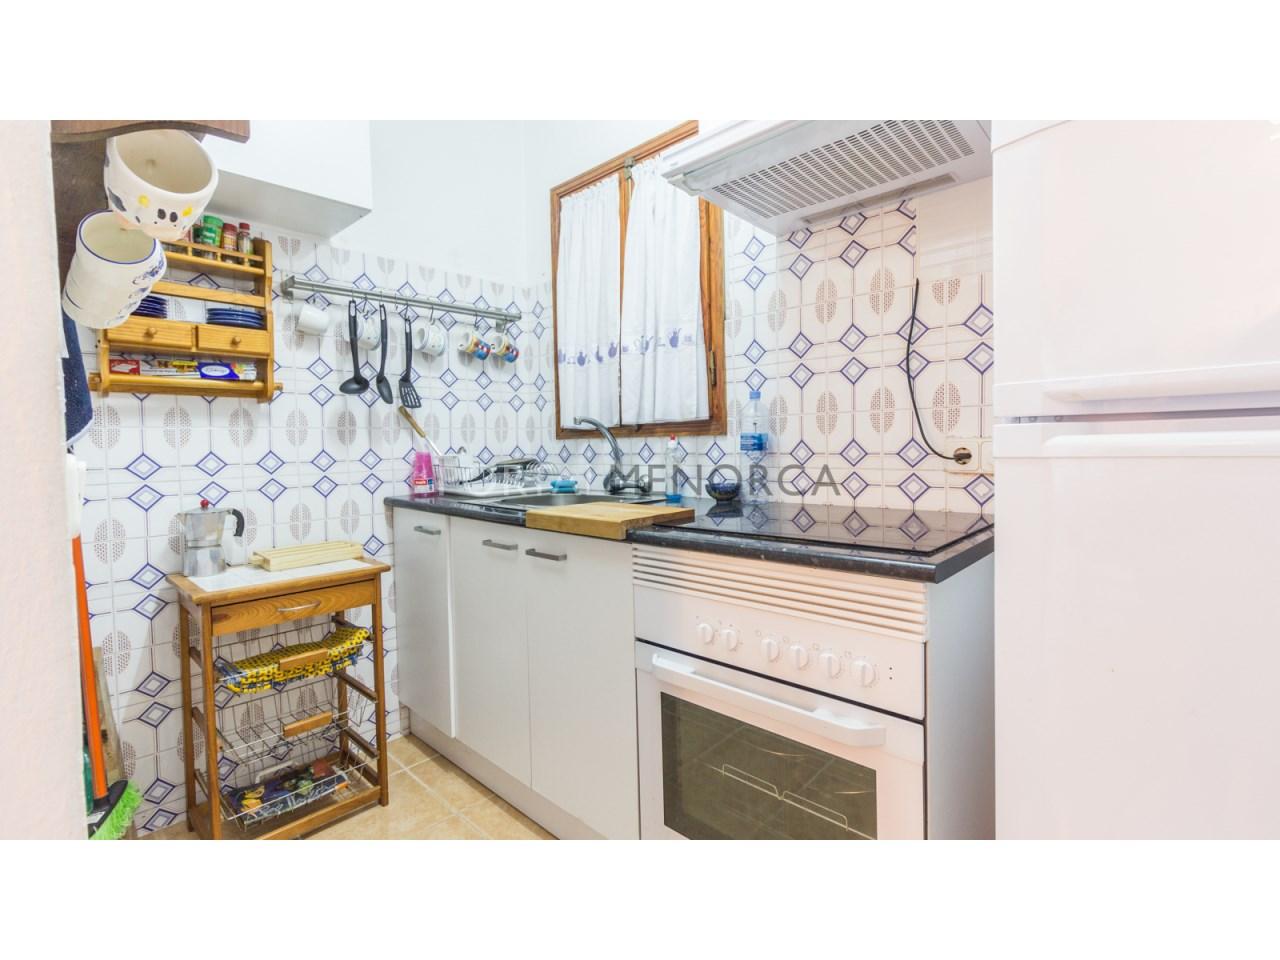 apartament for sale in calan porter menorca (4 de 7)